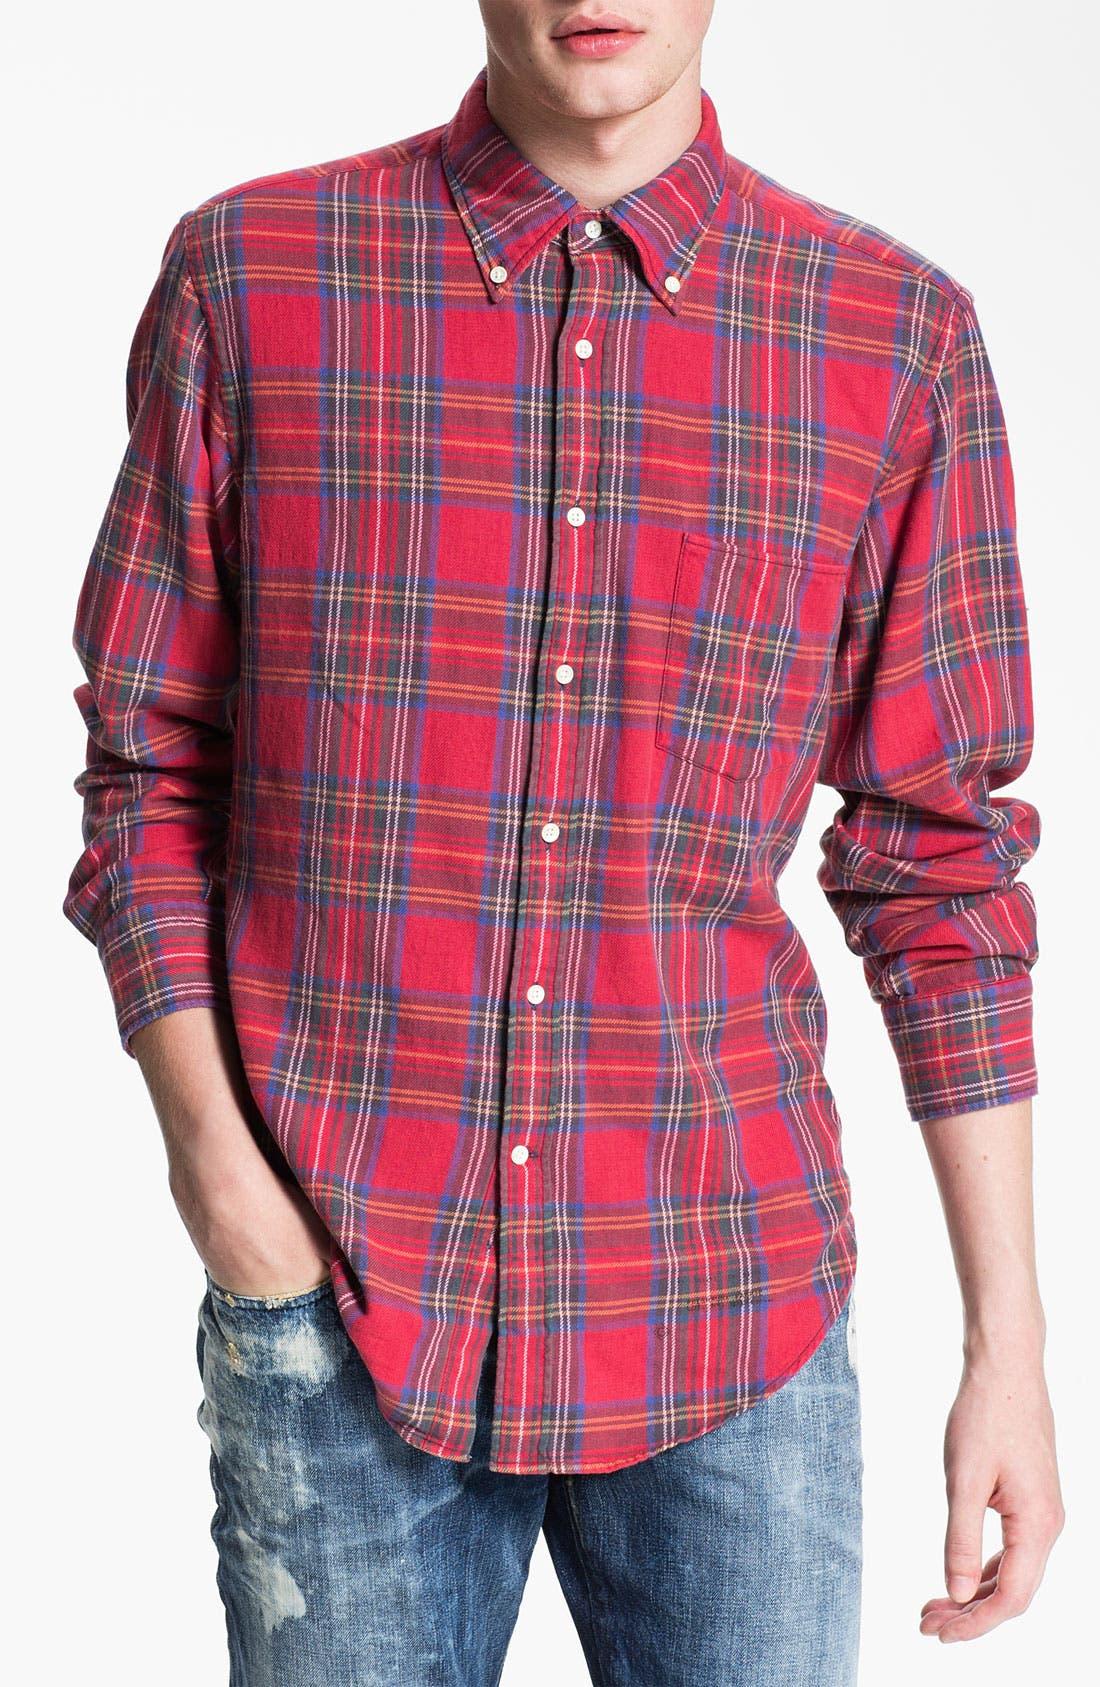 Alternate Image 1 Selected - Gant Rugger 'Tinkering' Twill Plaid Shirt